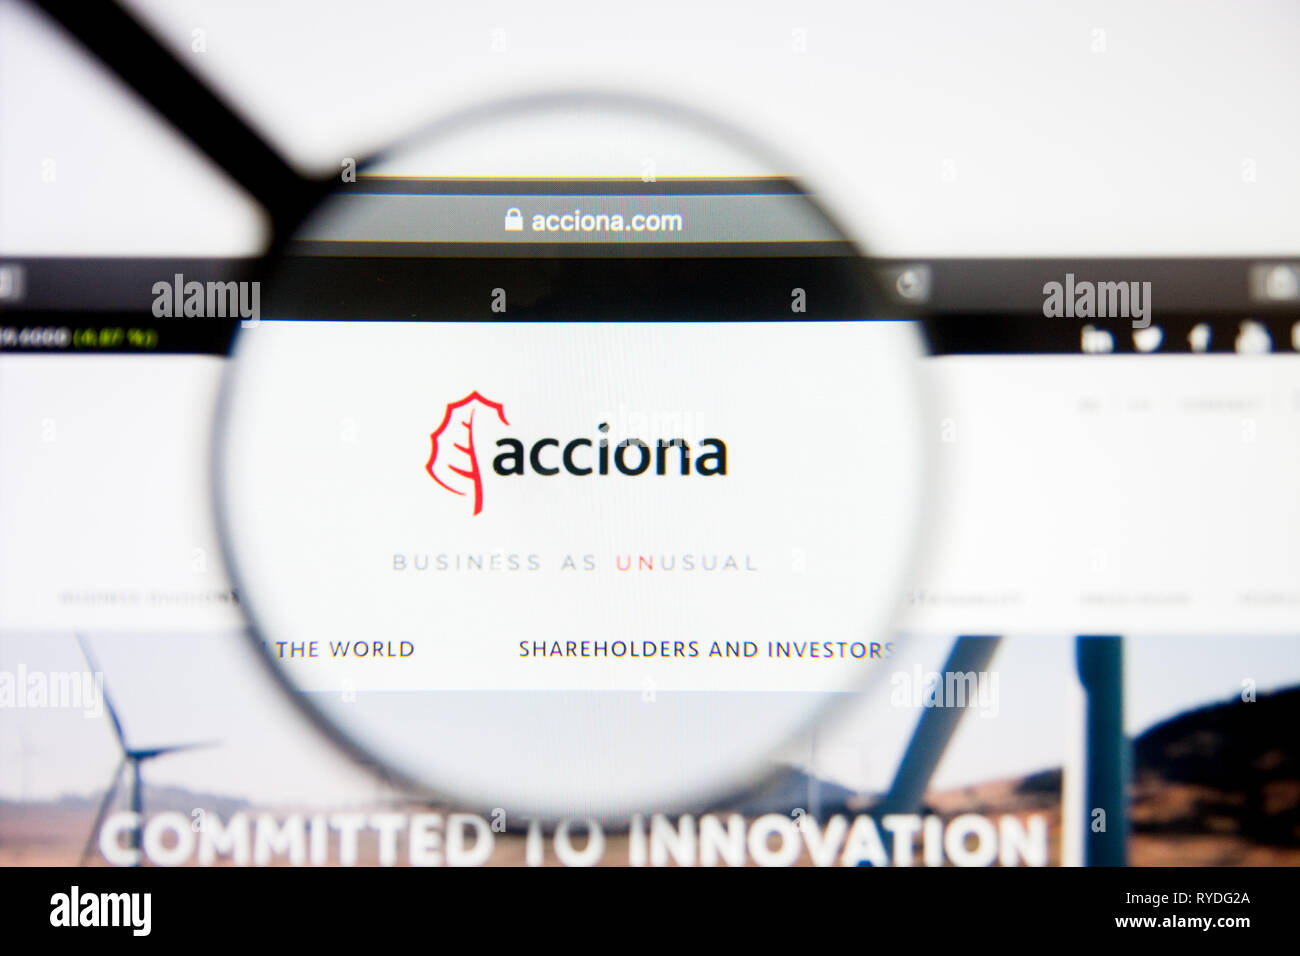 Los Angeles, California, USA - 5 March 2019: Acciona website homepage. Acciona logo visible on display screen, Illustrative Editorial - Stock Image